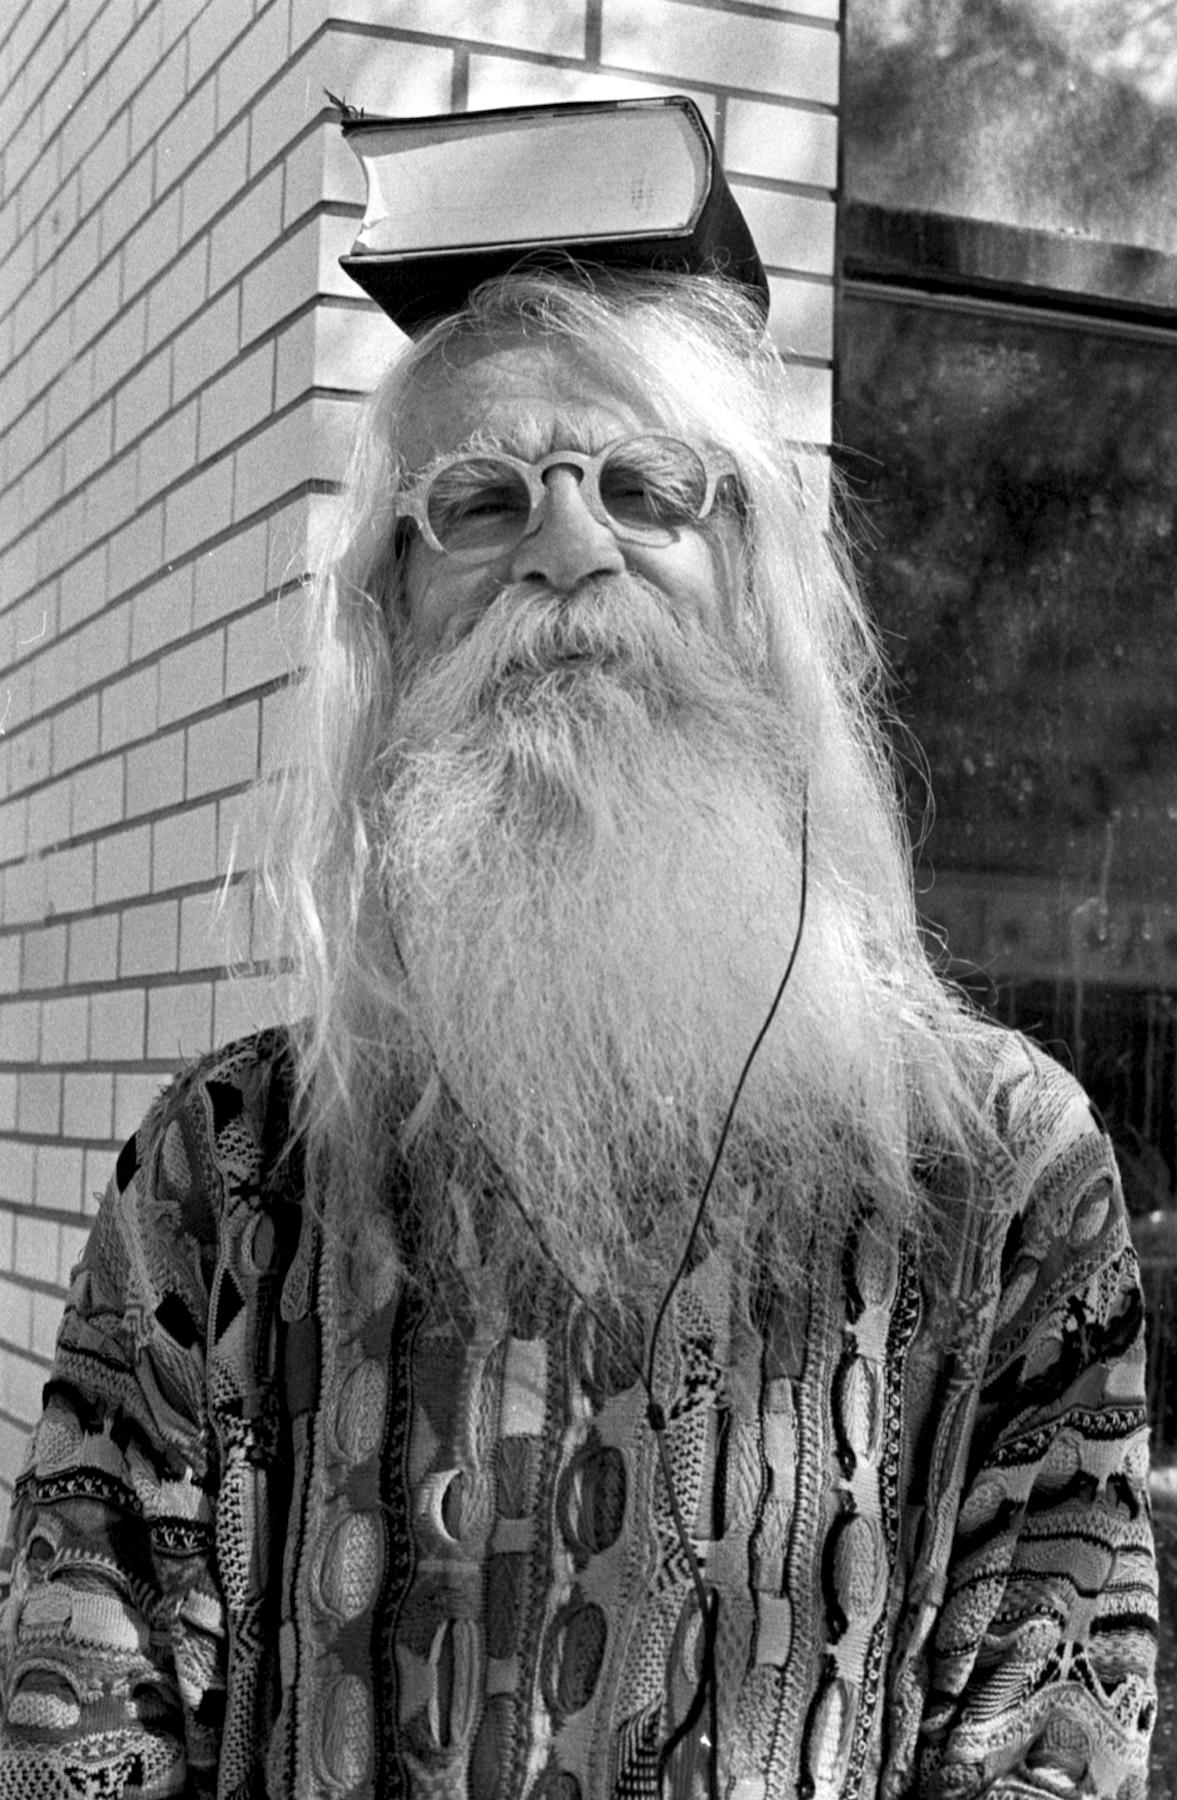 Greg Maslak - Man on the Street.